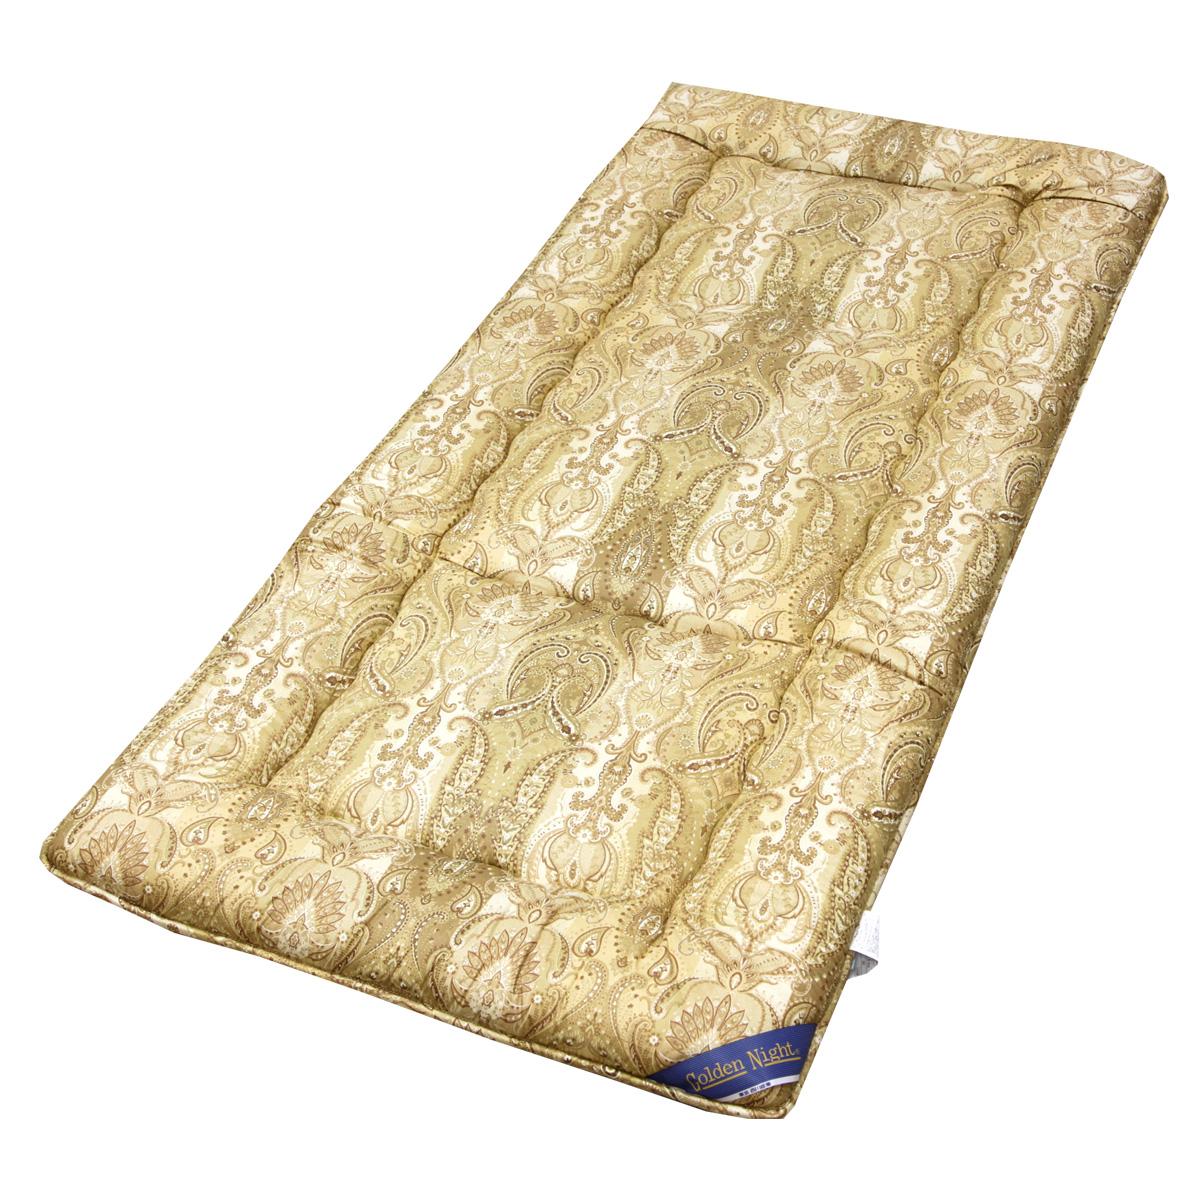 shijubo mattress patterns including wool mixed kneeling futons